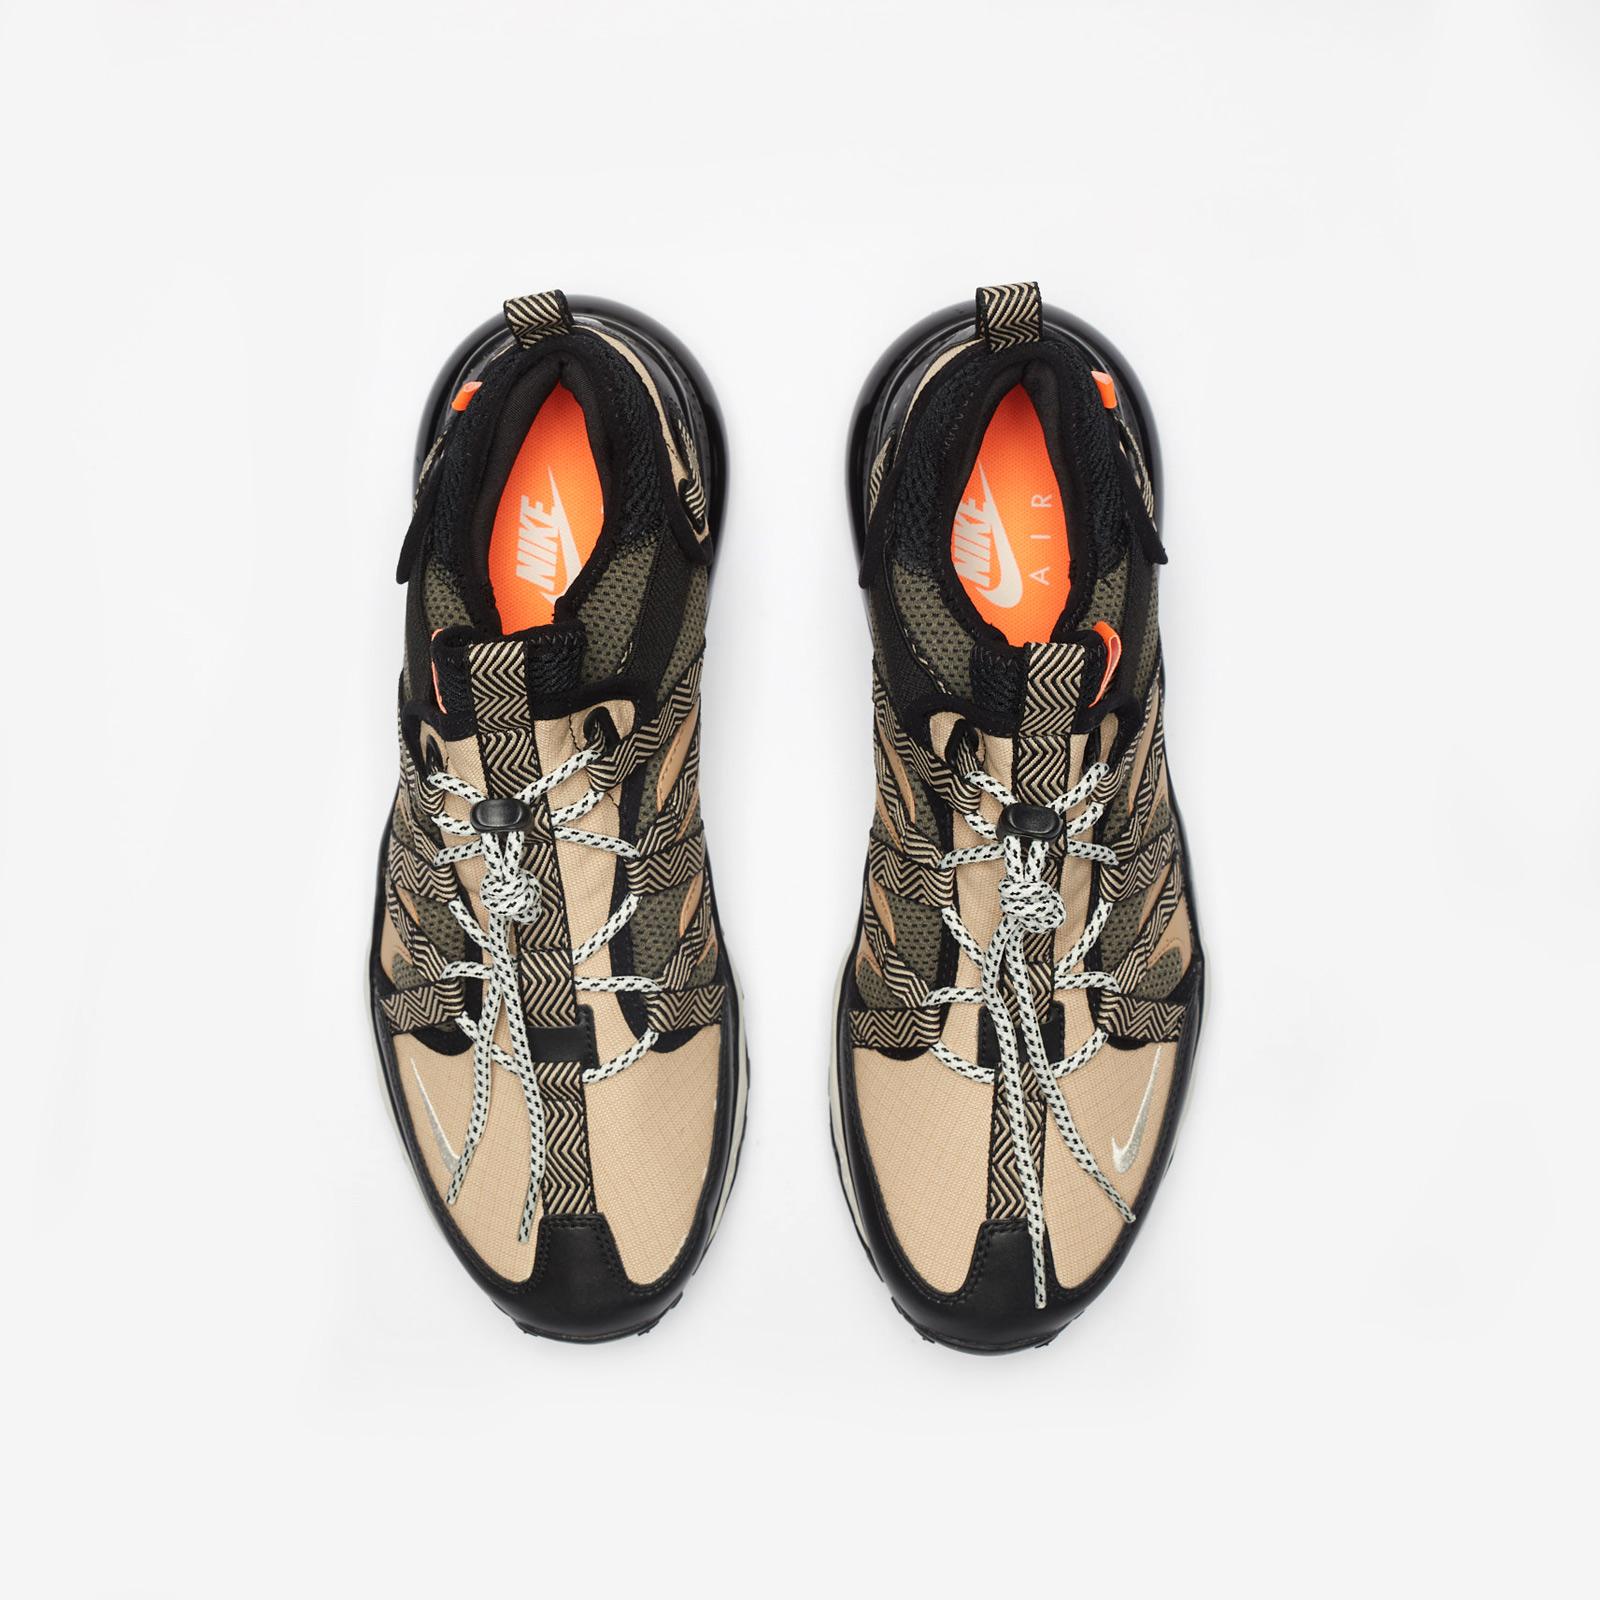 Legibilidad préstamo tornillo  Nike Air Max 270 Bowfin - Aj7200-001 - Sneakersnstuff | sneakers &  streetwear online since 1999